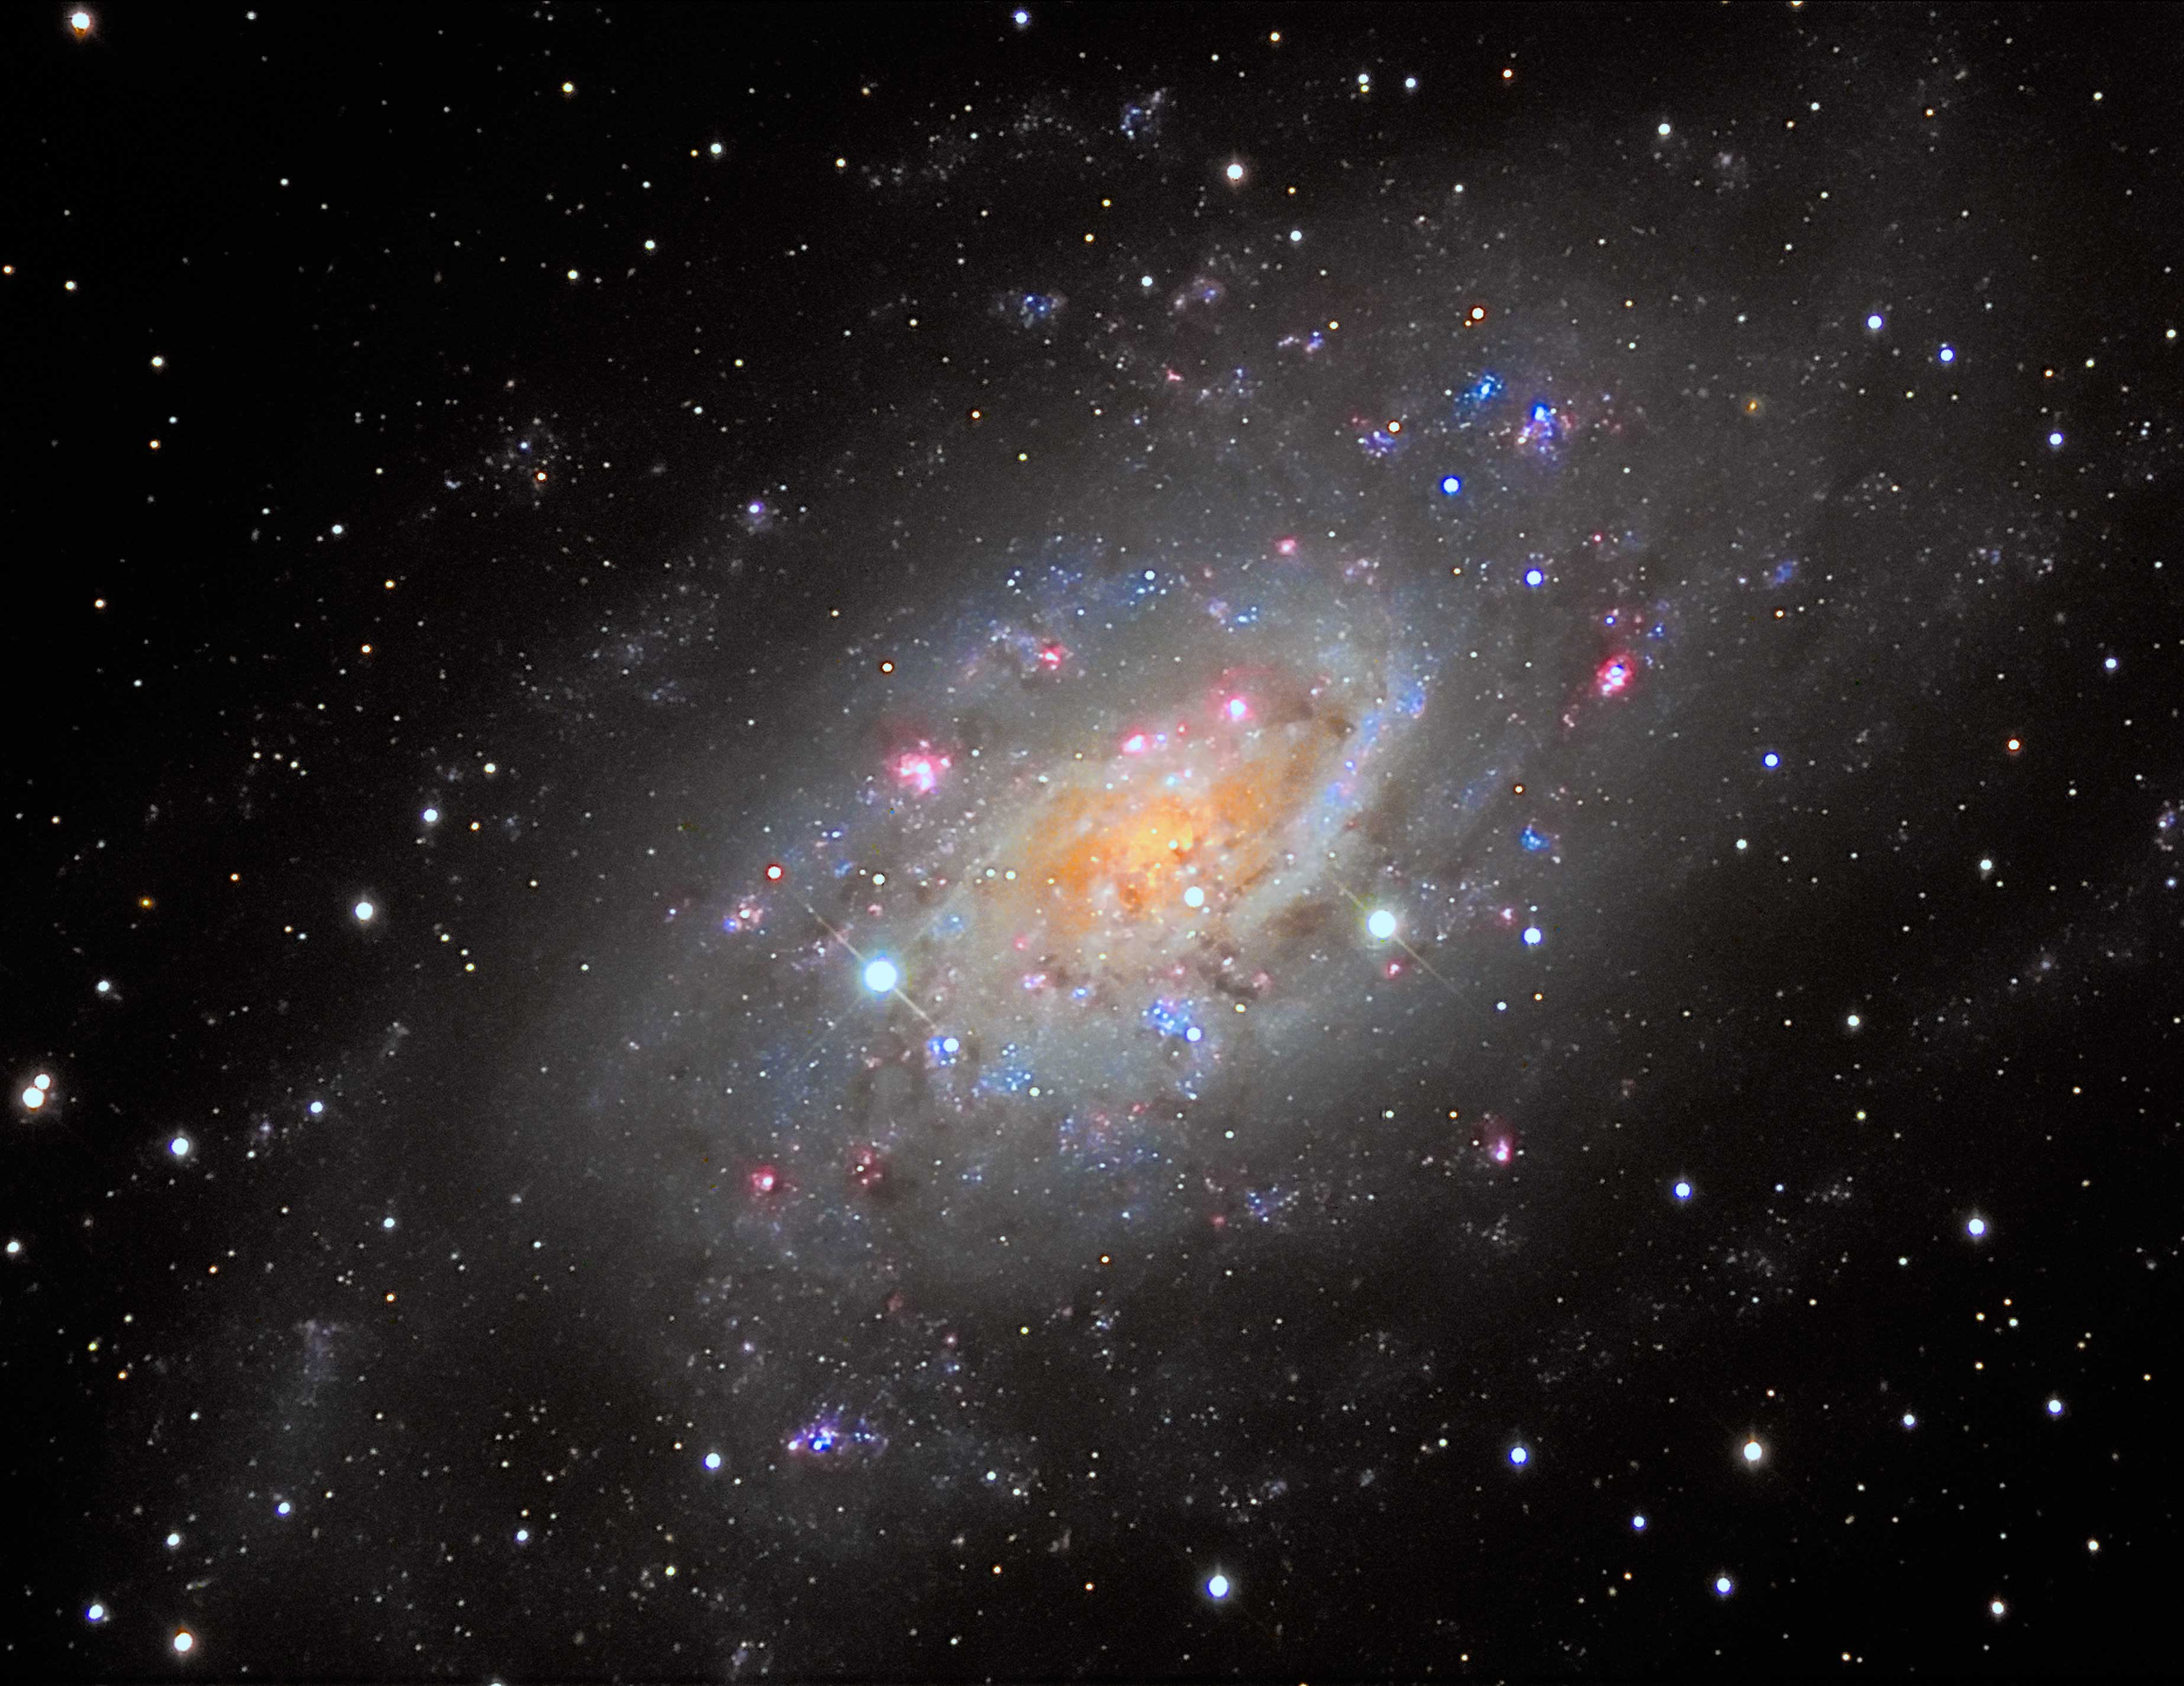 NGC 2403 - Wikipedia